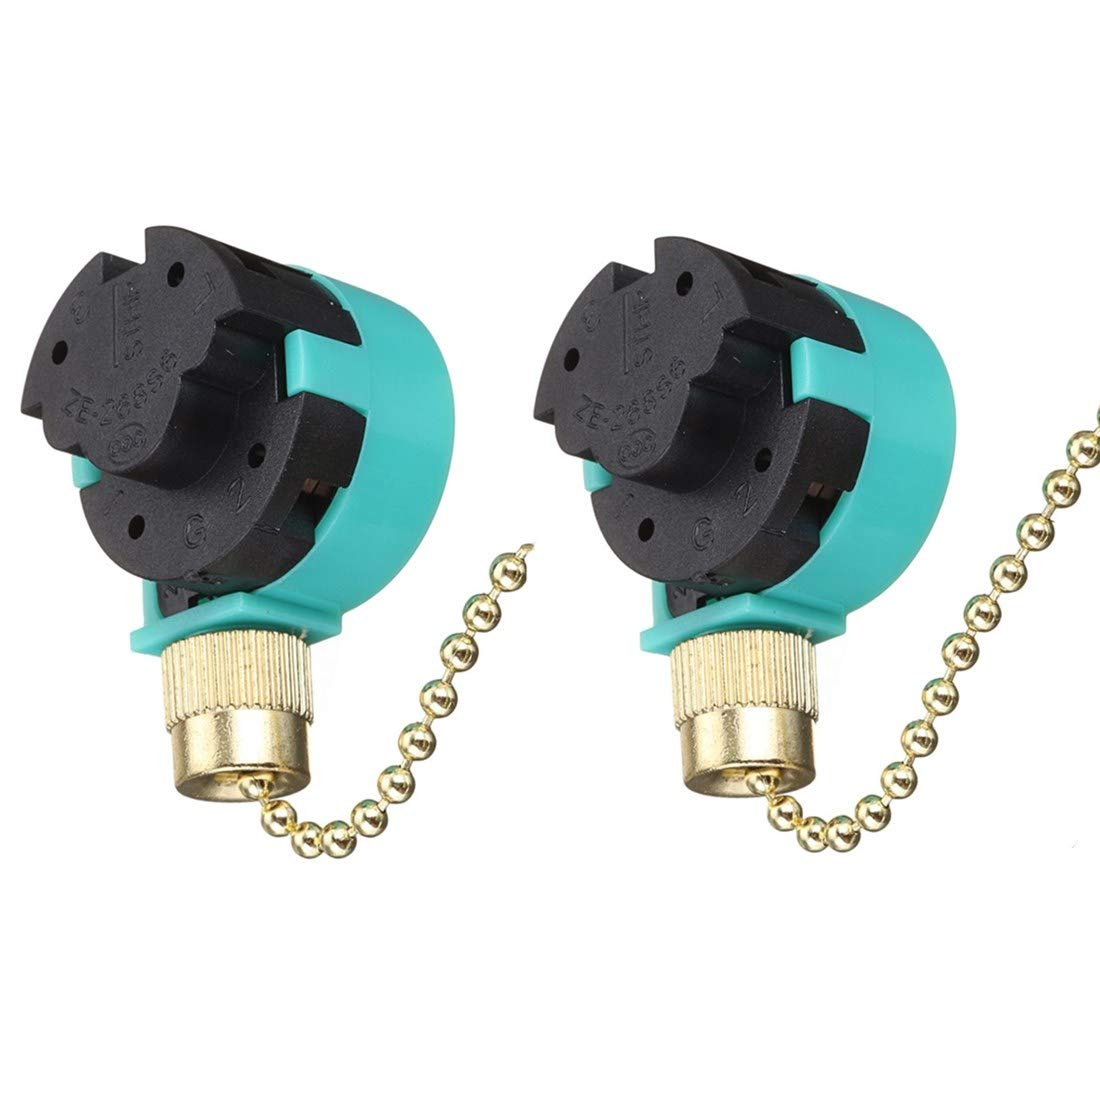 2PACK Fan Switch Pull Chain Control ZE-268S6 ZE-208S6 3 Speed 4 wire Speed Control Switch Ceiling Fan Speed Control Switch (Brass)